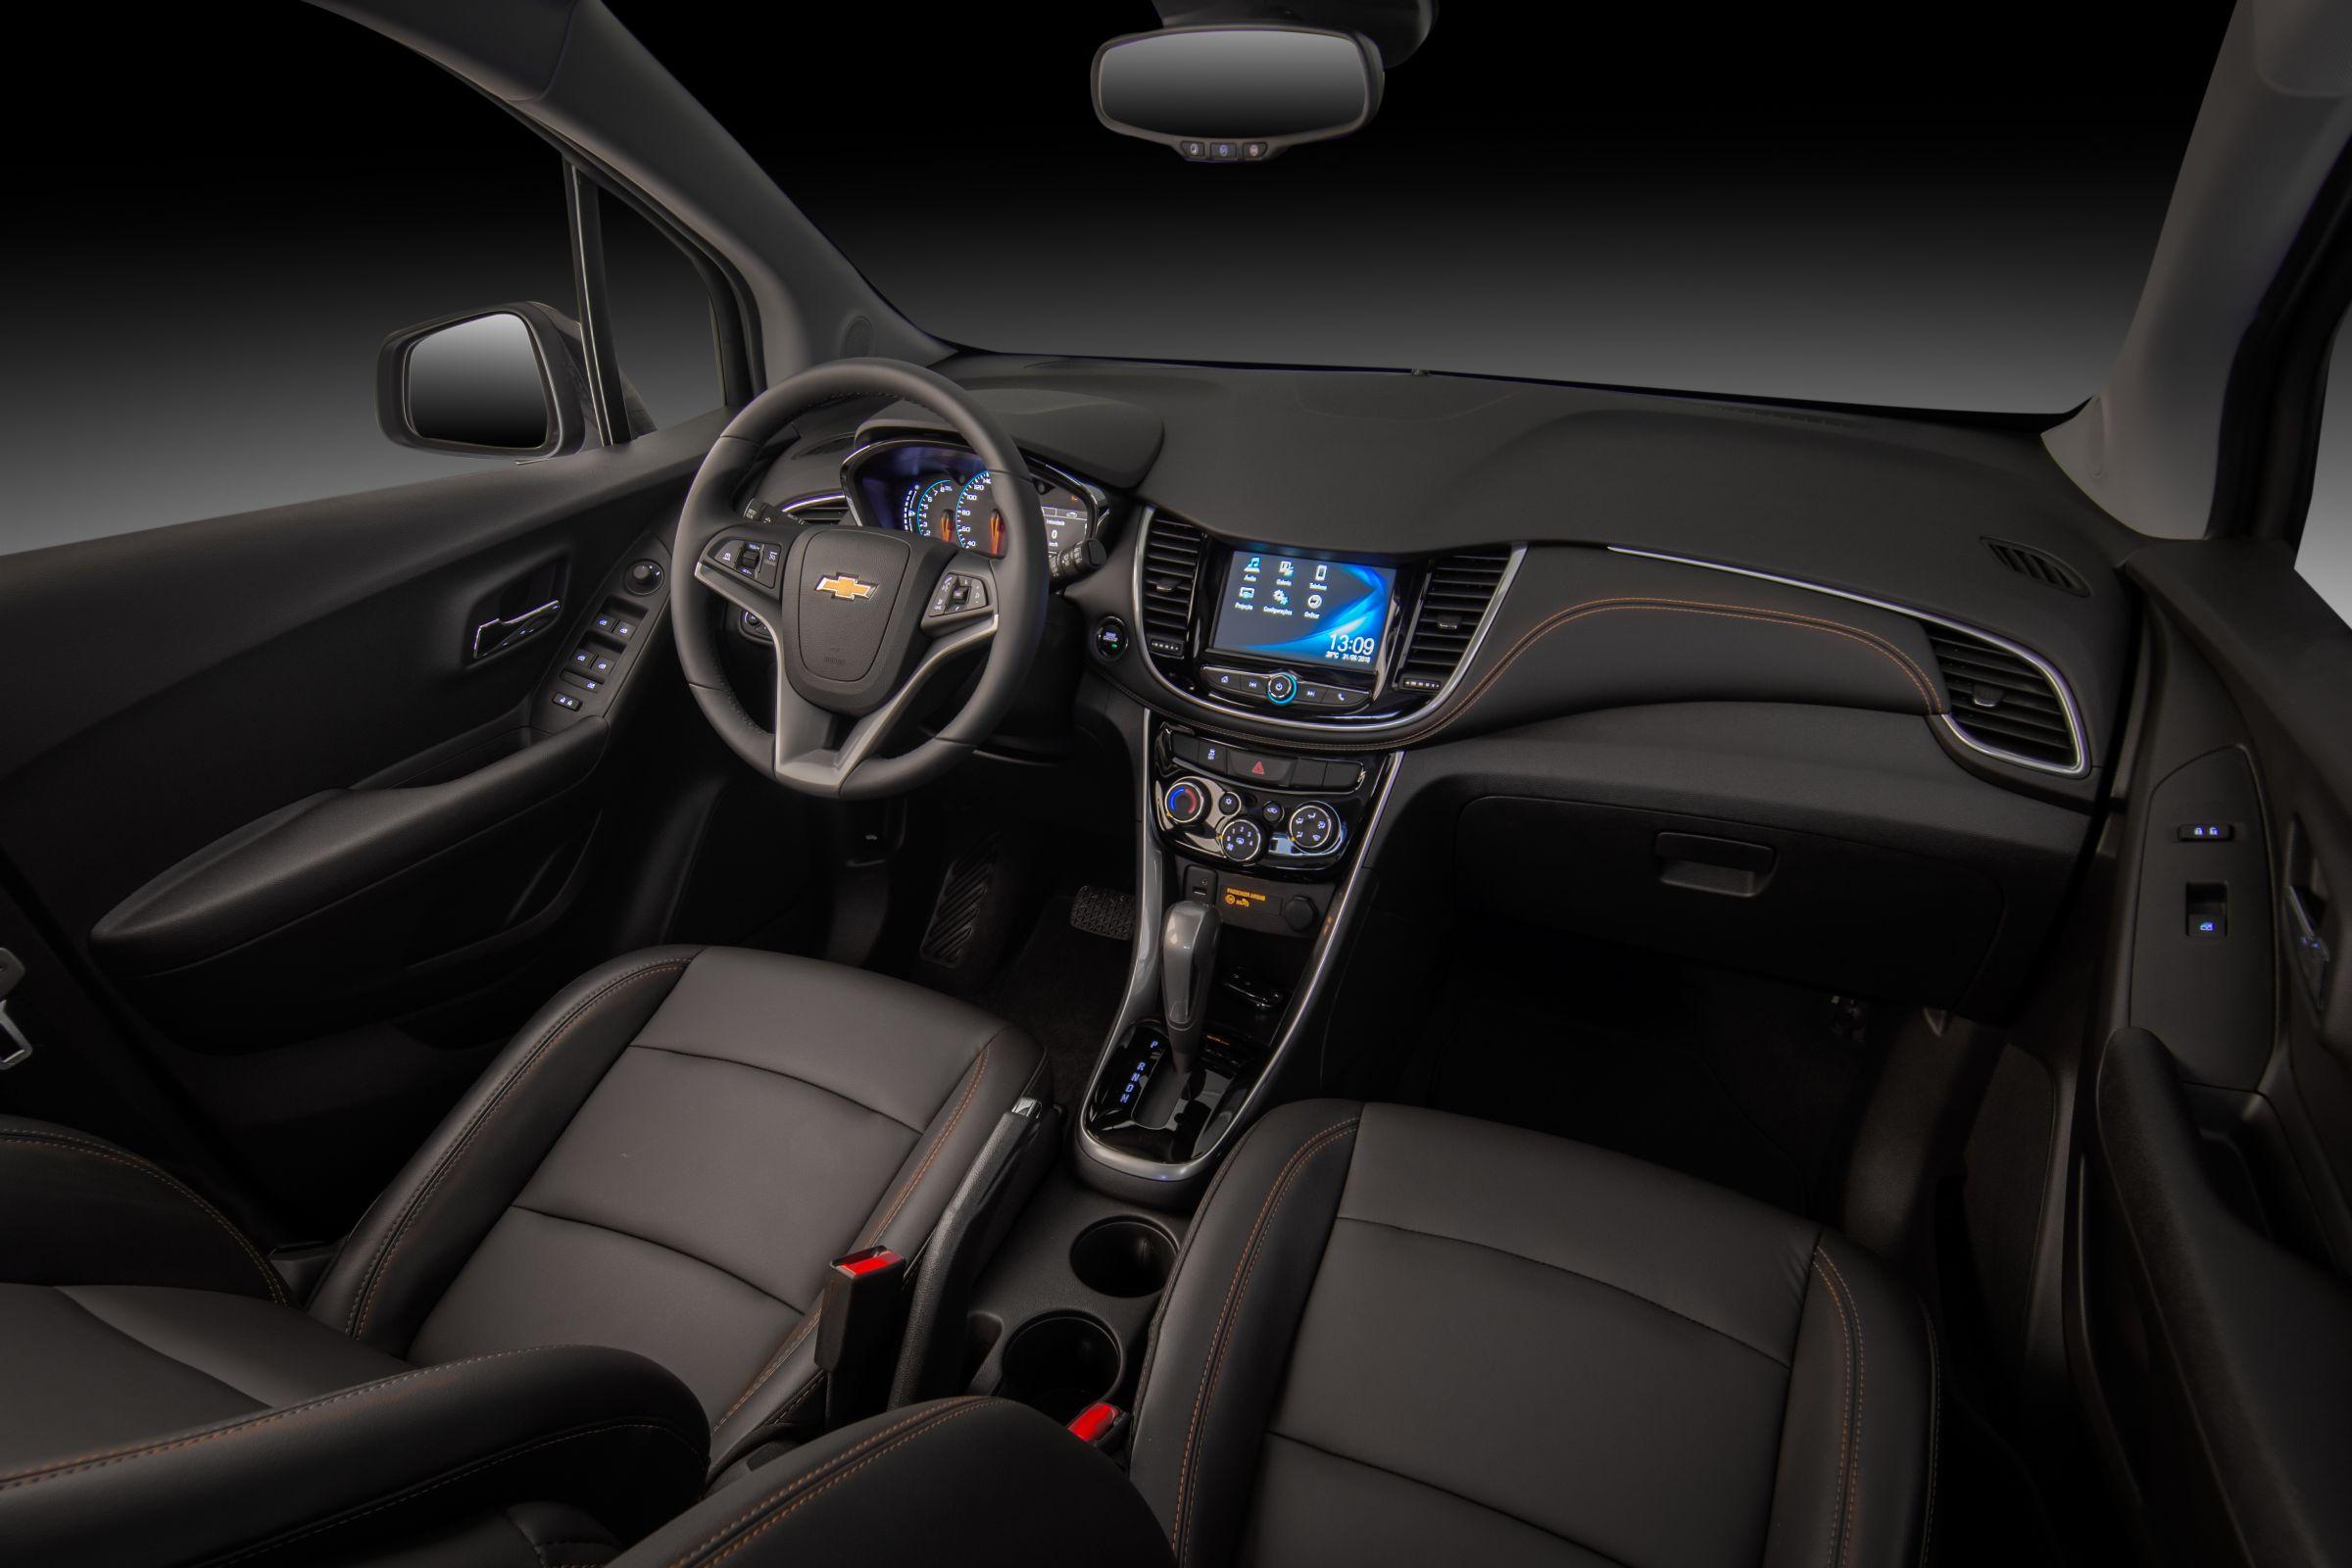 Chevrolet Tracker Midnight tem interior todo preto